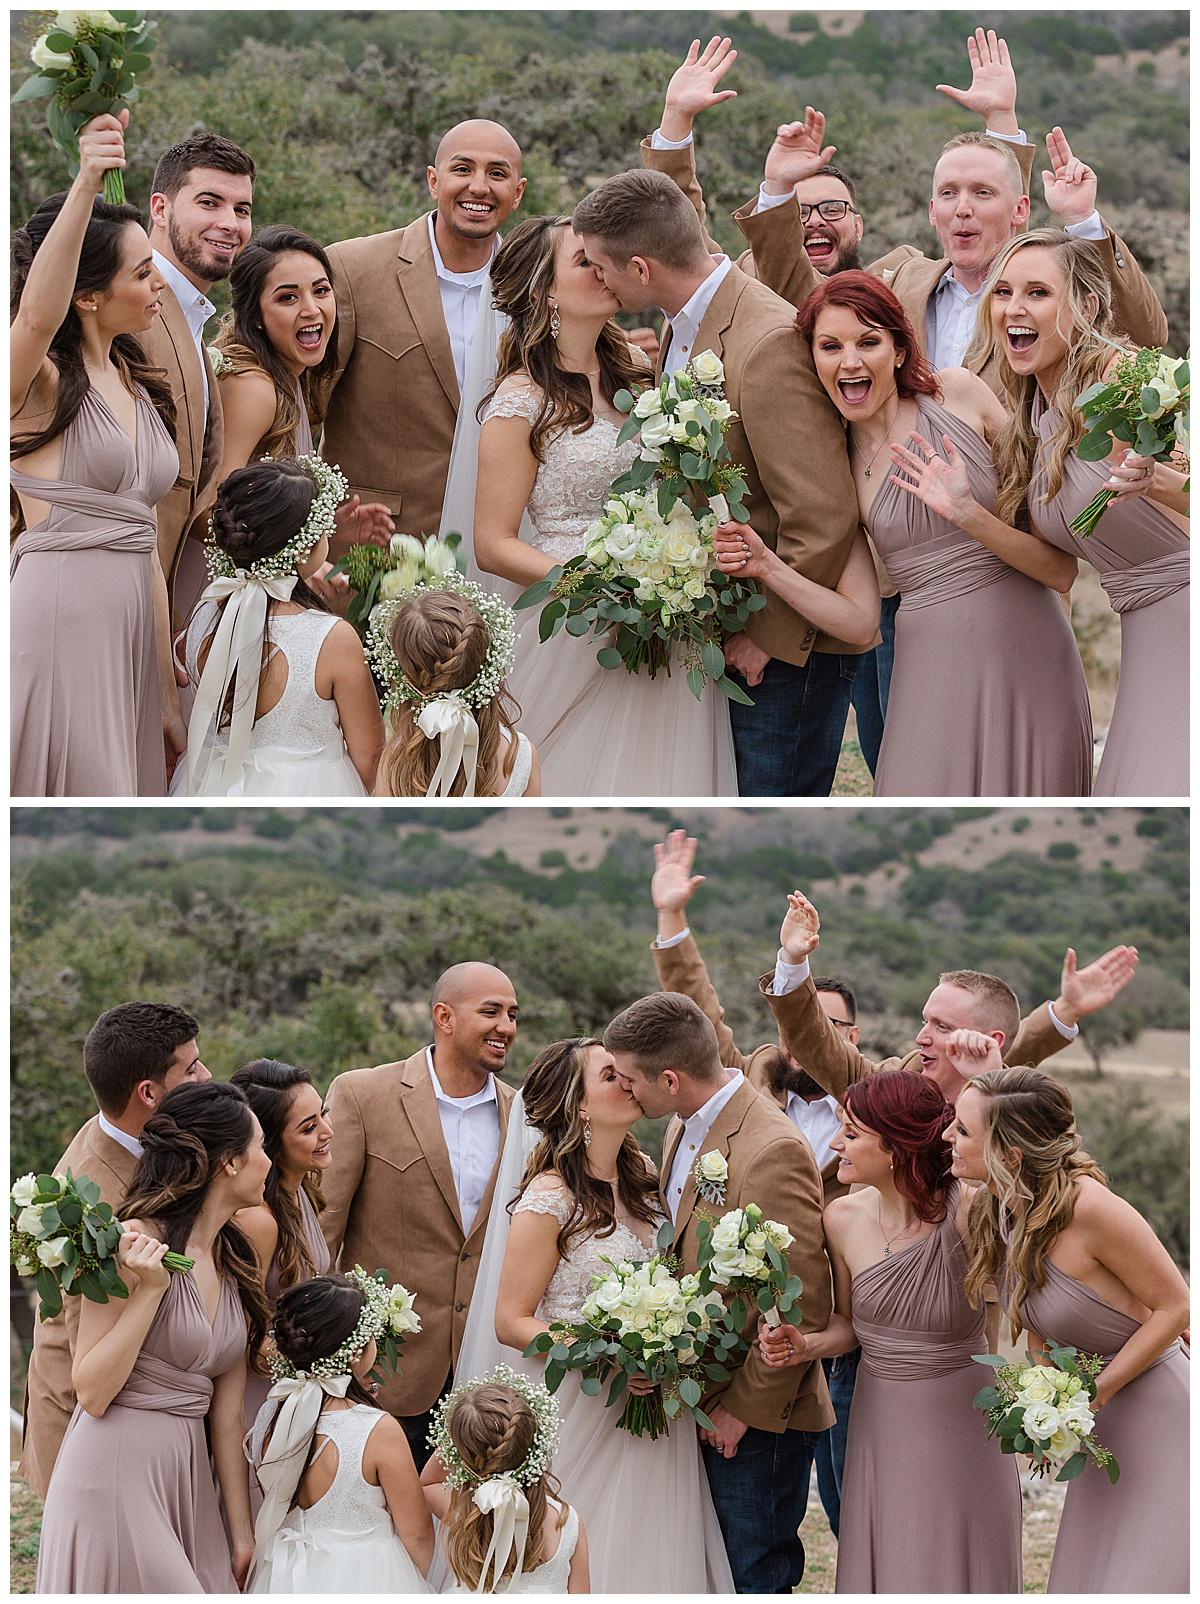 Wedding-Photographer-Texas-Hill-Country-Happy-H-Ranch-Comfor-Texas-Carly-Barton-Photography_0039.jpg